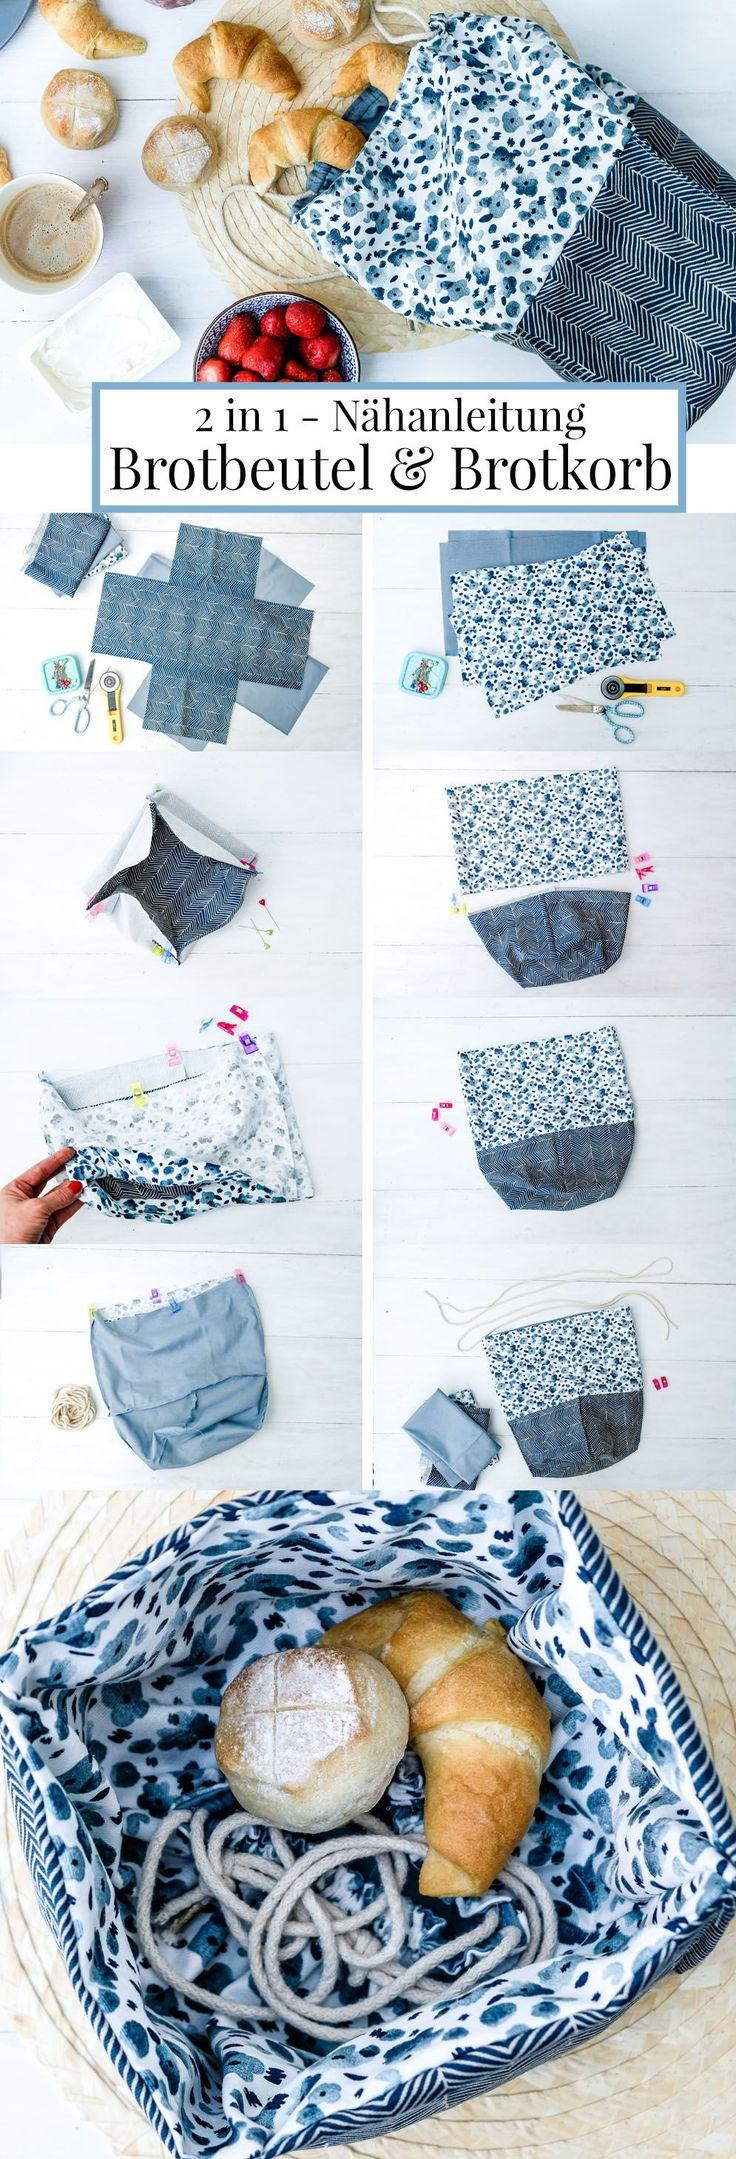 2 in 1: Bread Bag & Bread Basket -> Bread Bag Basket | DIY sewing instructions   – DIY